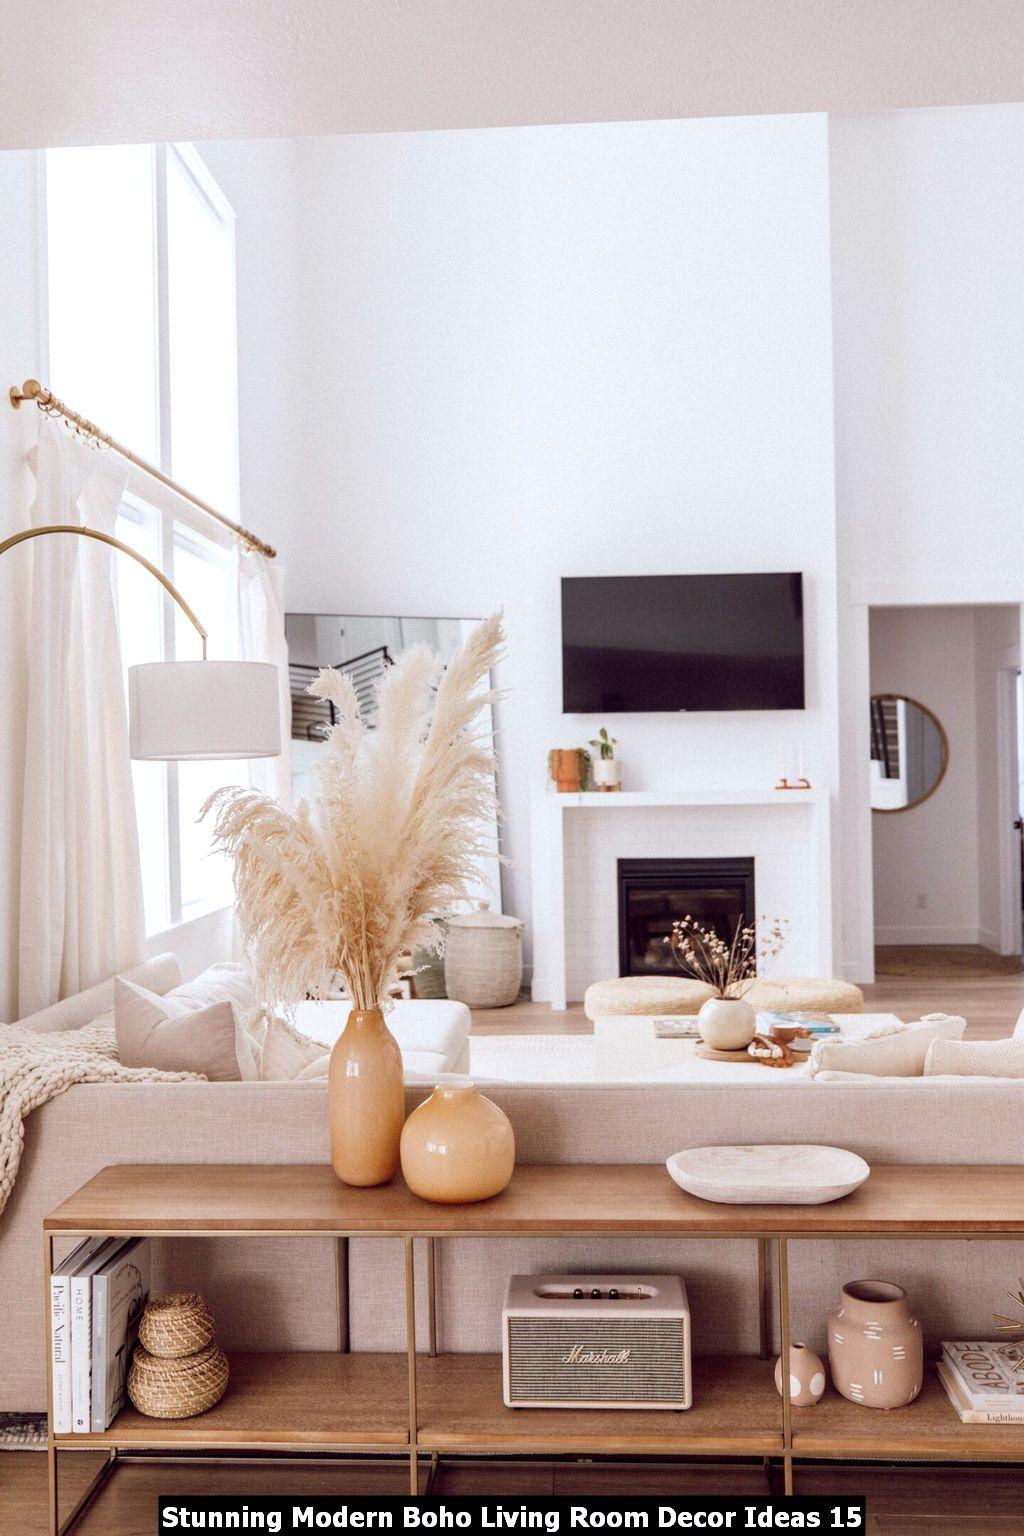 Stunning Modern Boho Living Room Decor Ideas 15